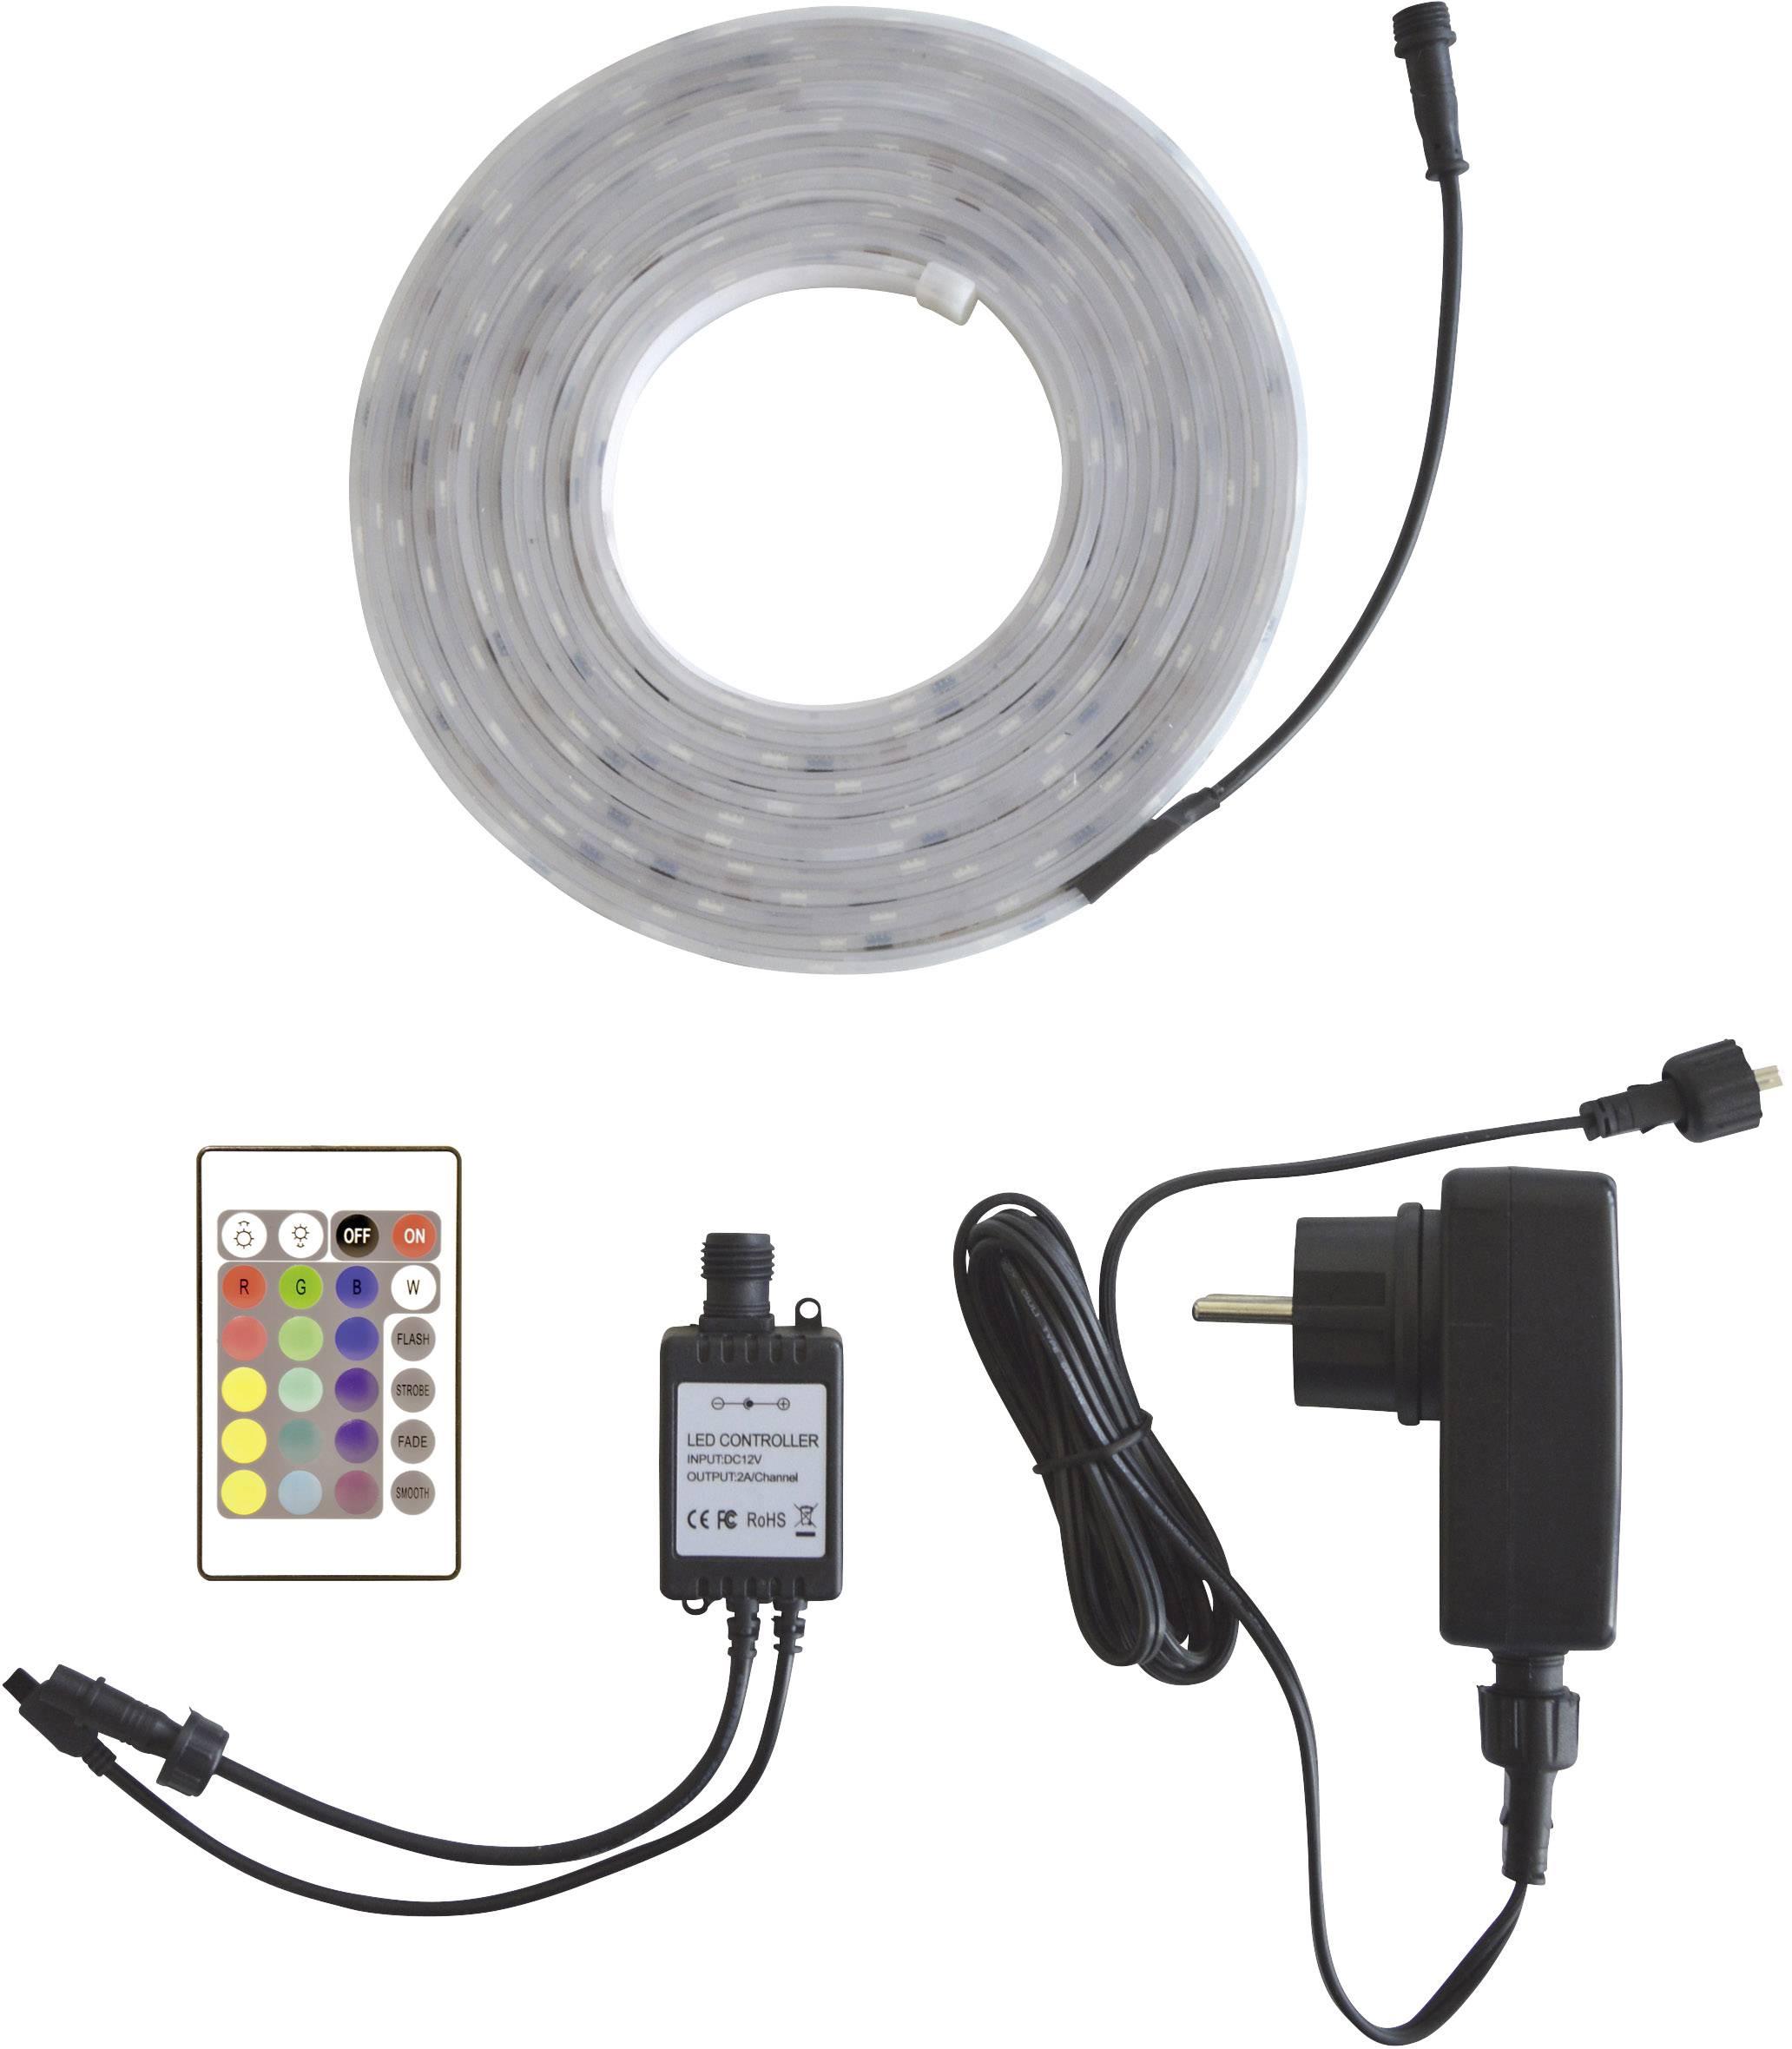 Kompletní sada LED pásků Müller Licht 57030, 12 V, 27 W, RGB, 500 cm